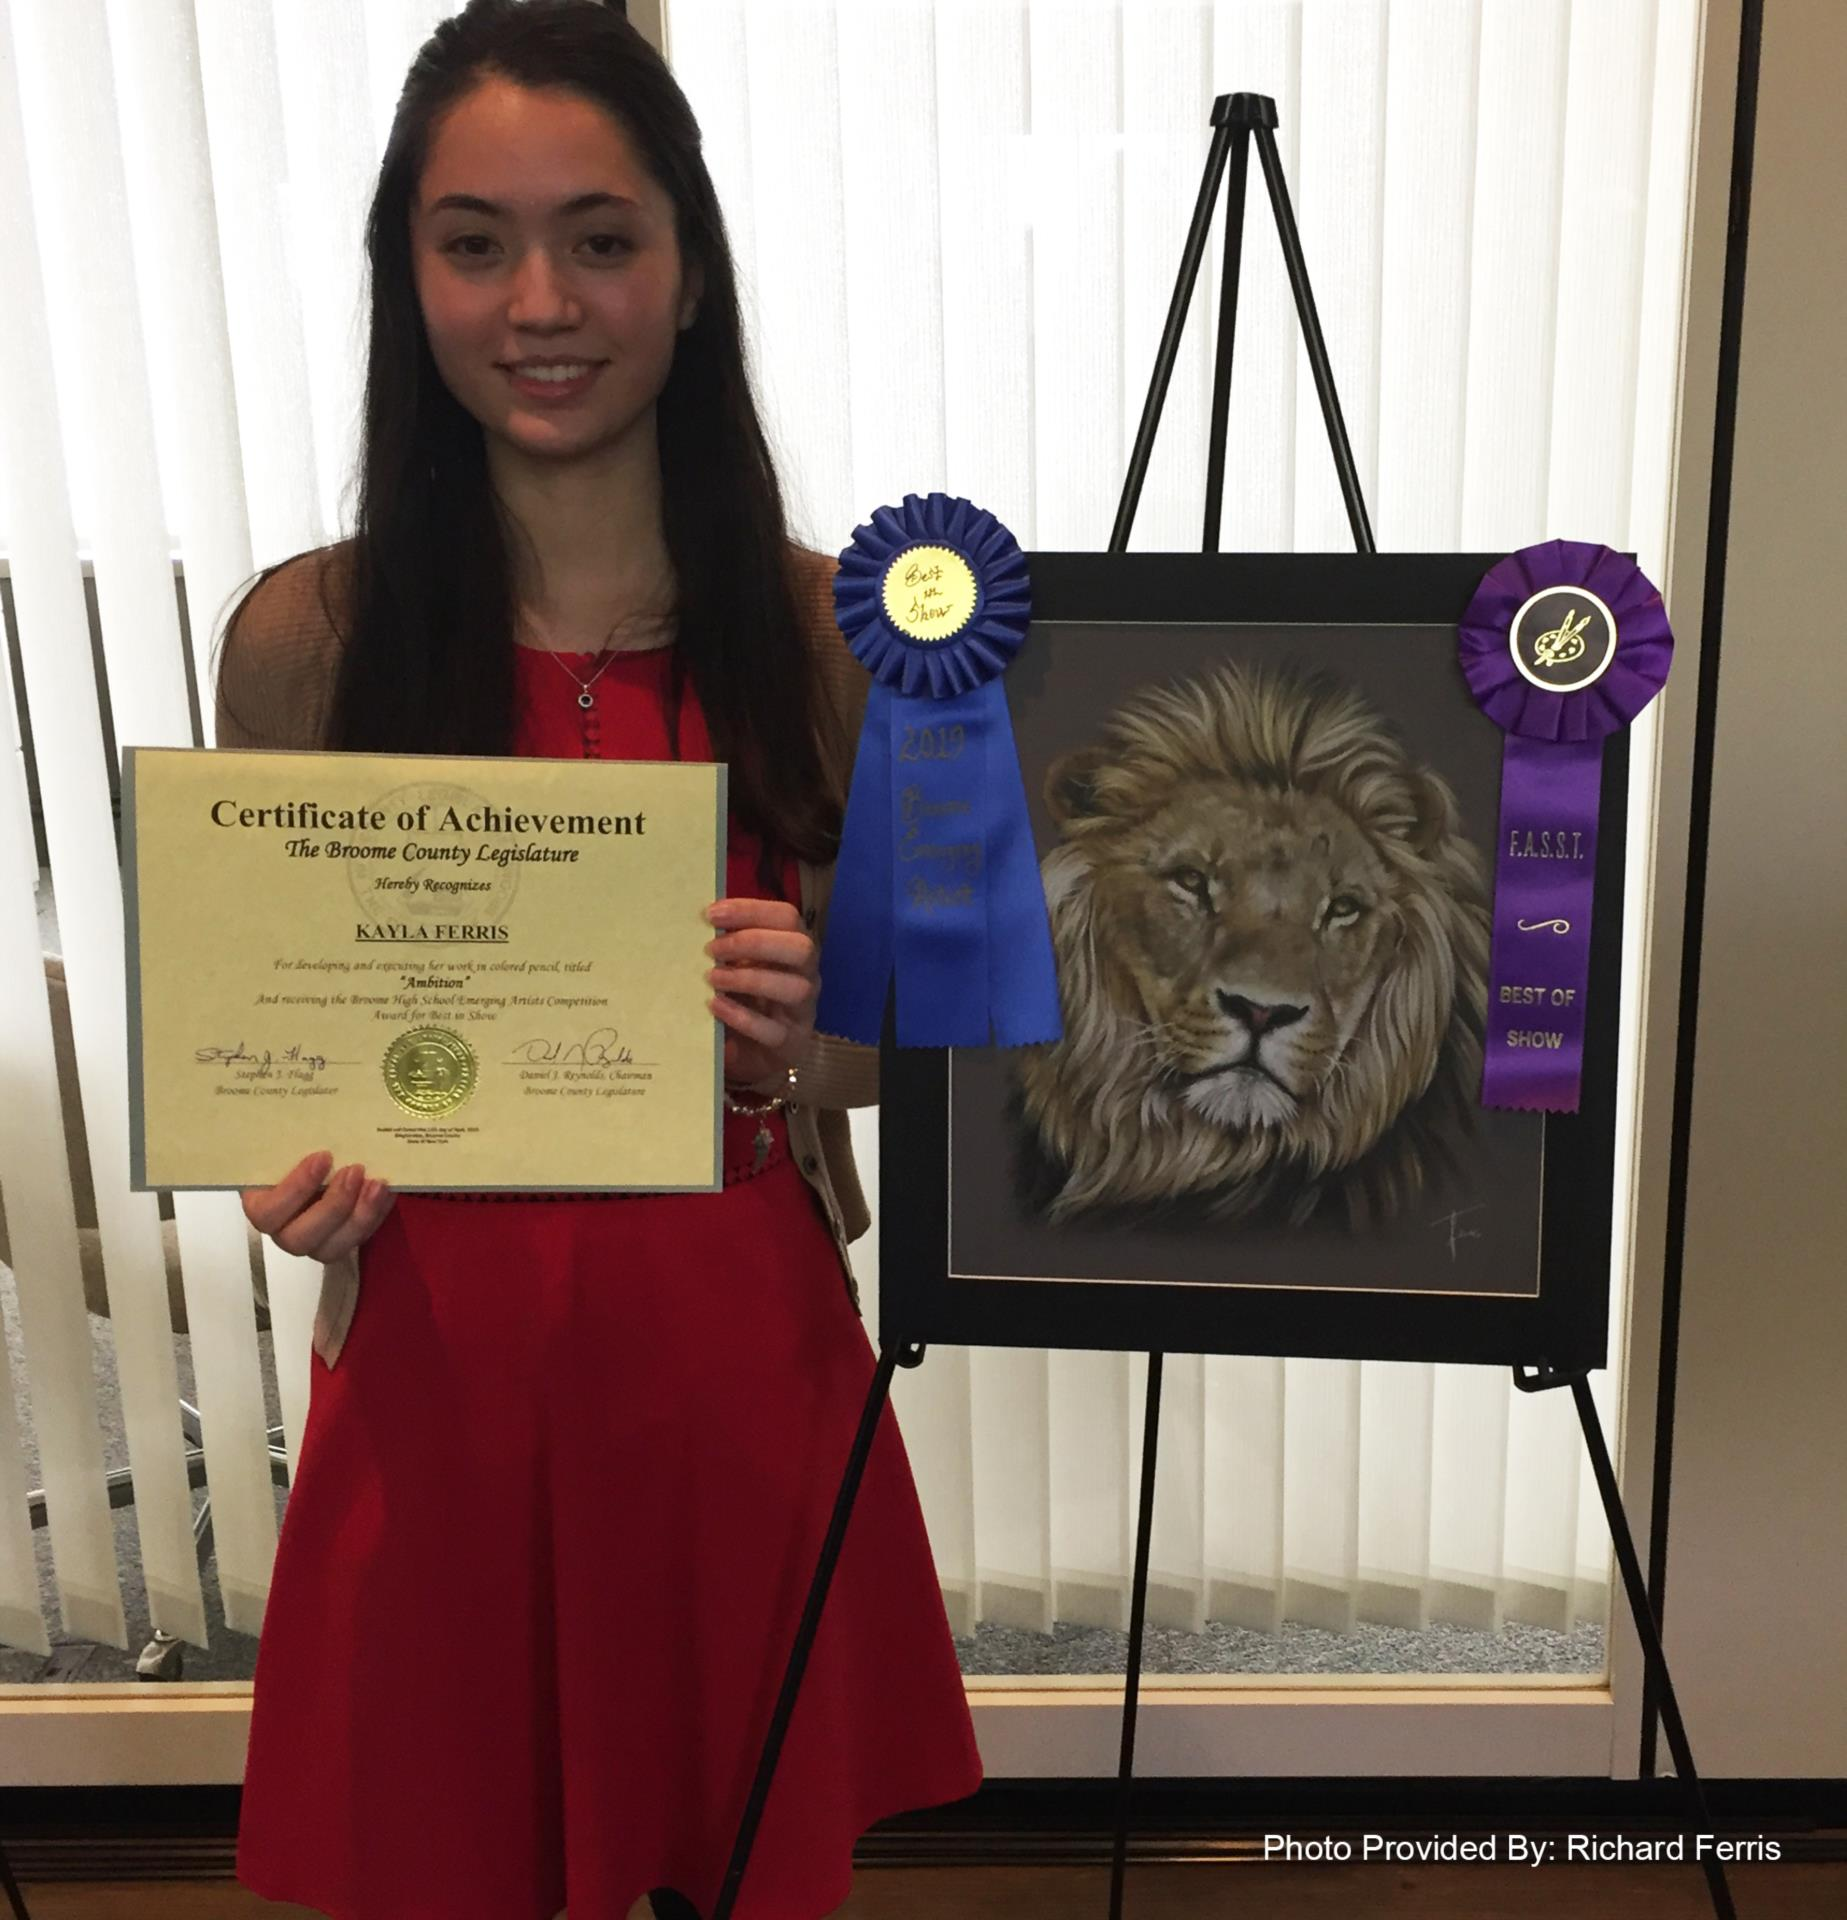 kayla ferris recognized by Broome County Legislature